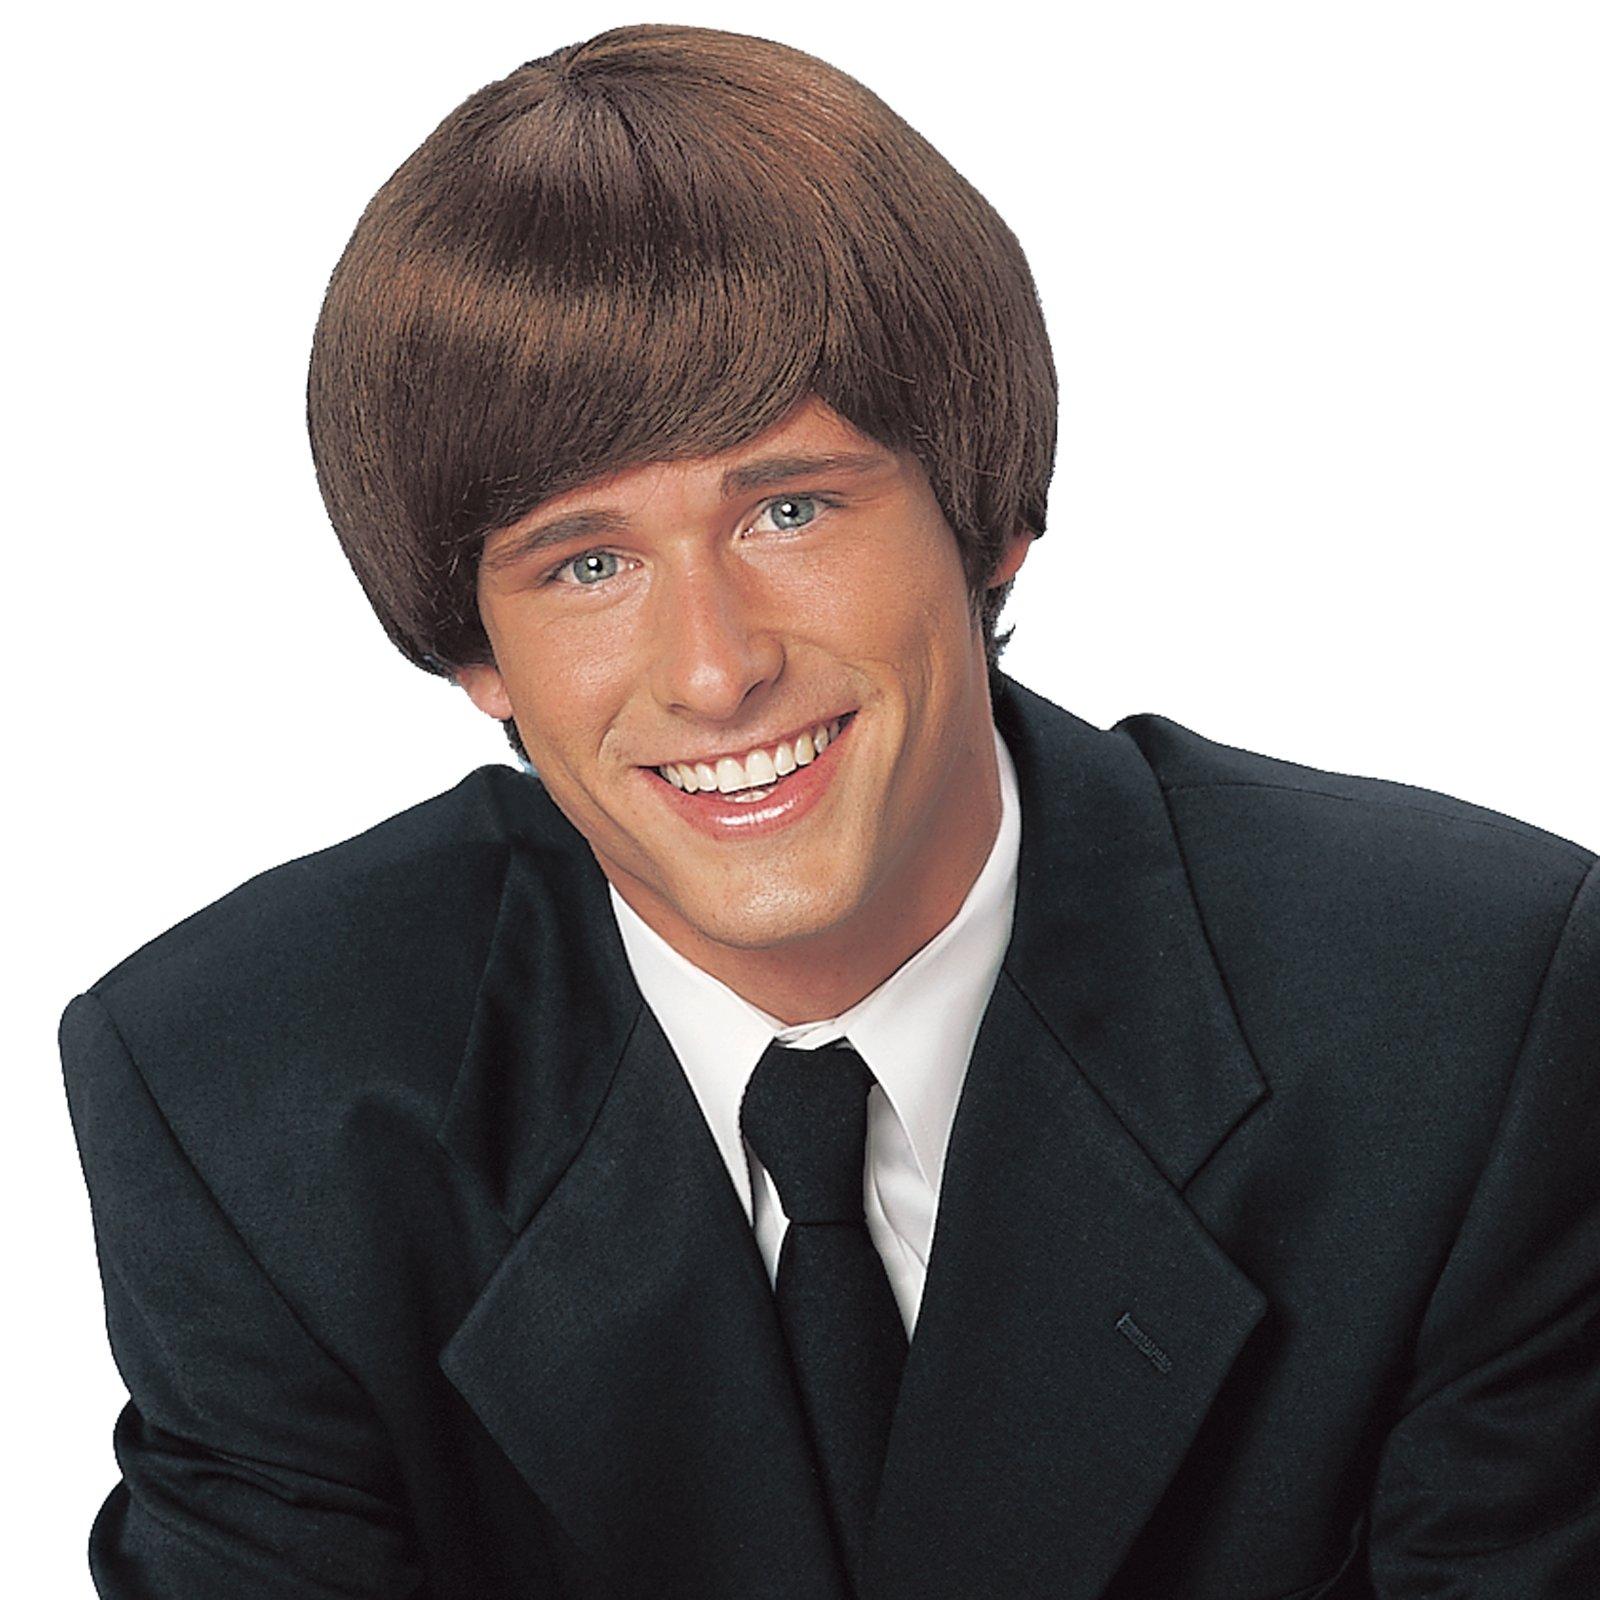 80s bangs hairstyles ~ hair is our crown